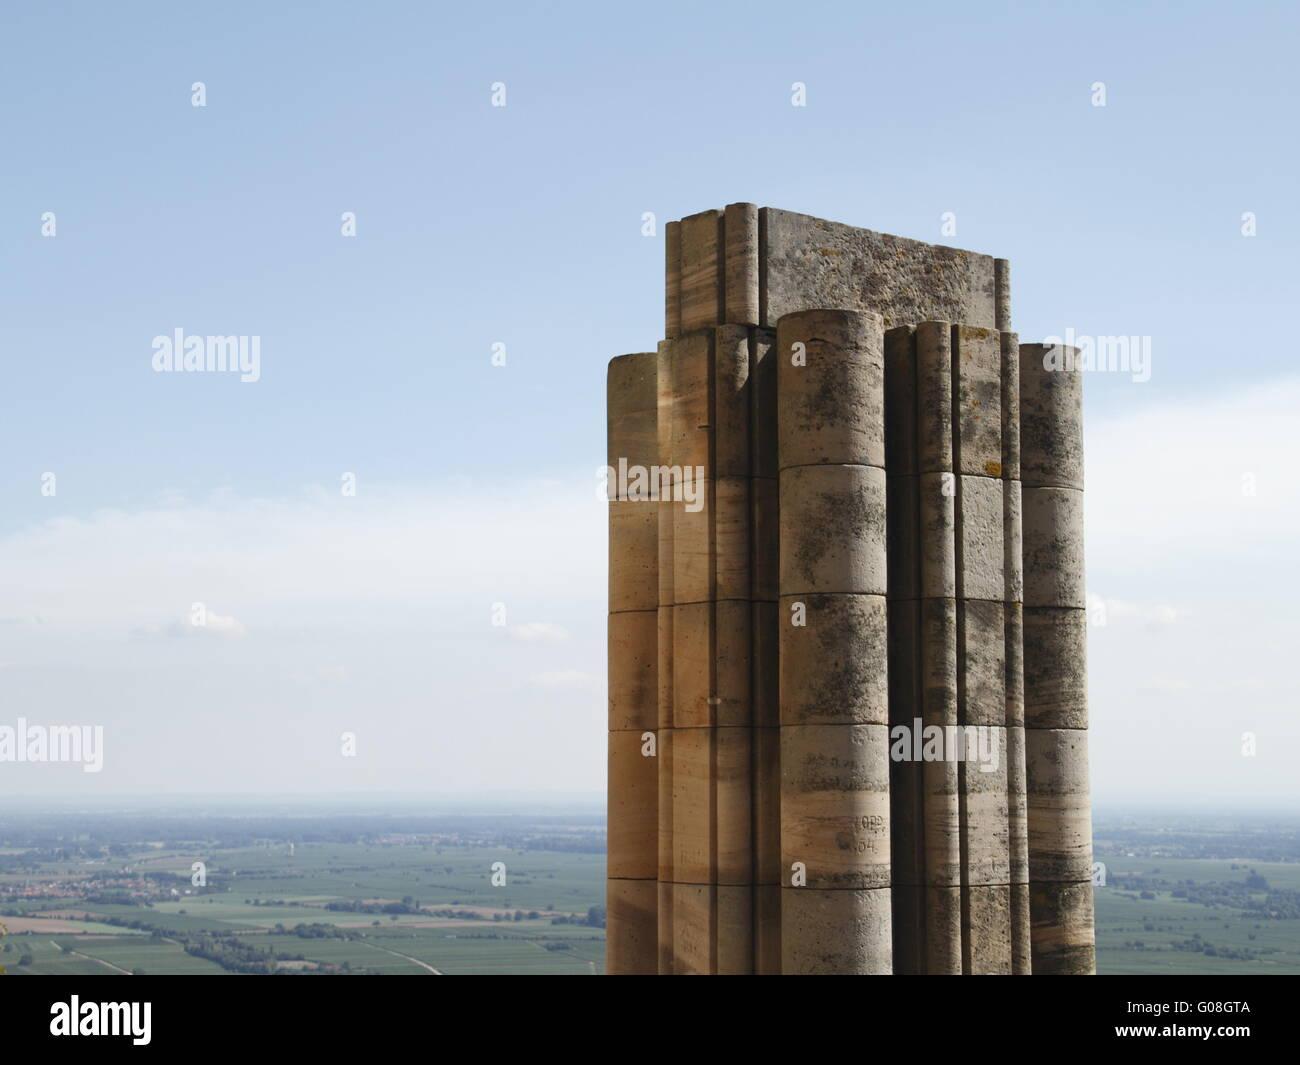 construction art - Stock Image